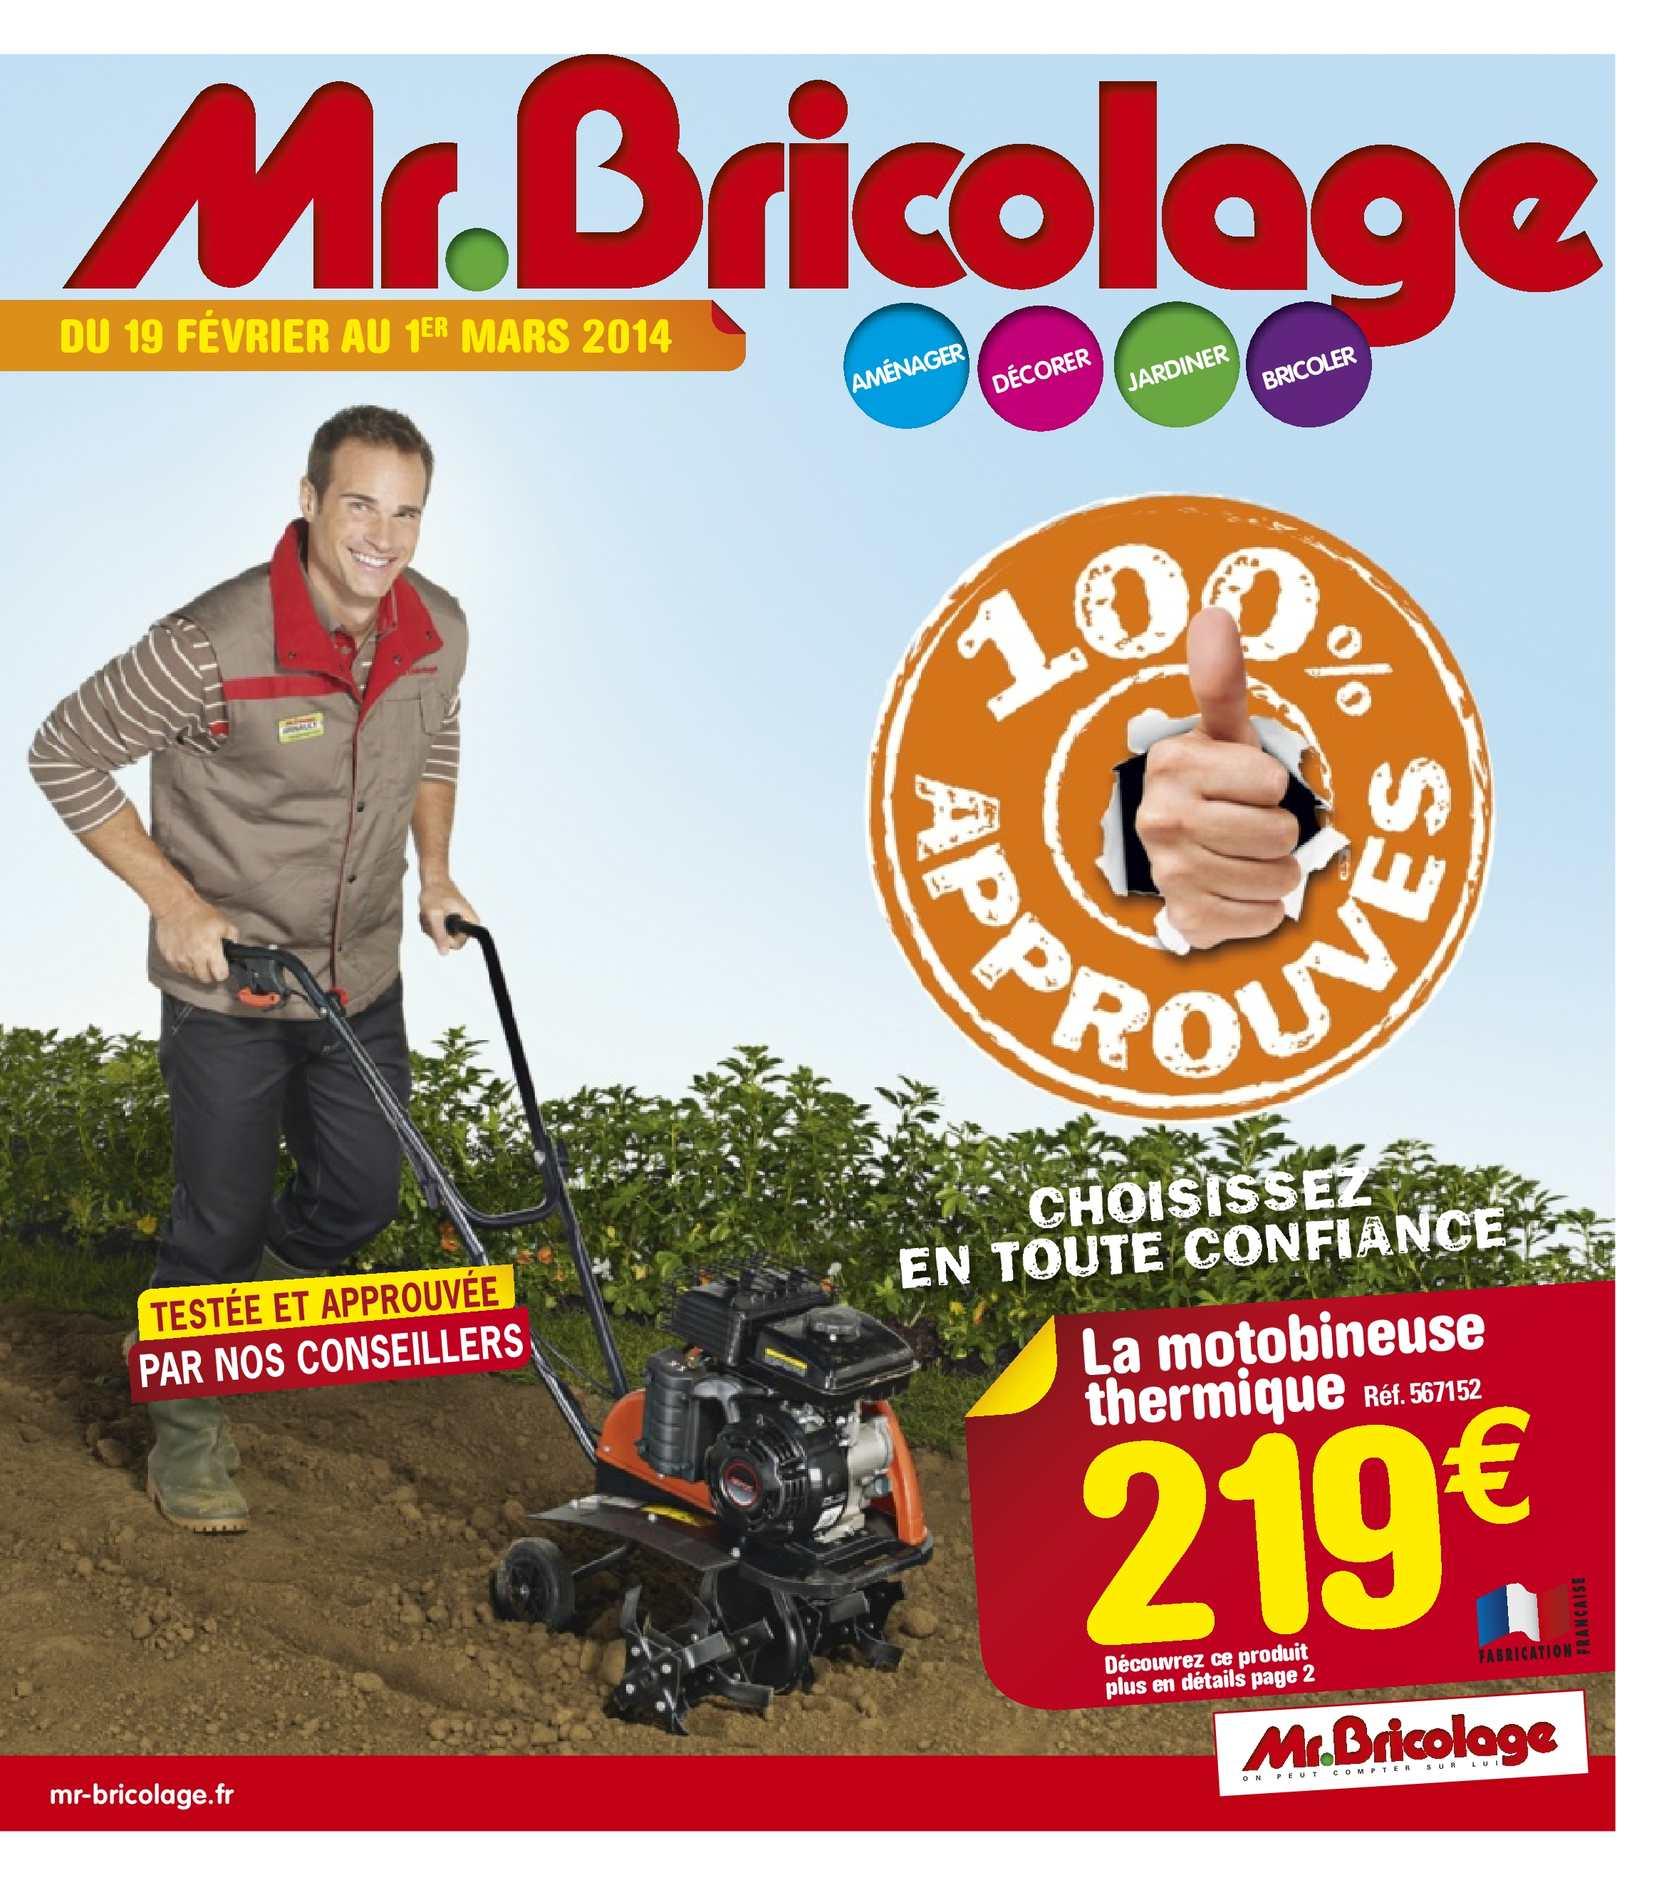 p1 Meilleur De De Mr Bricolage Salon De Jardin Concept